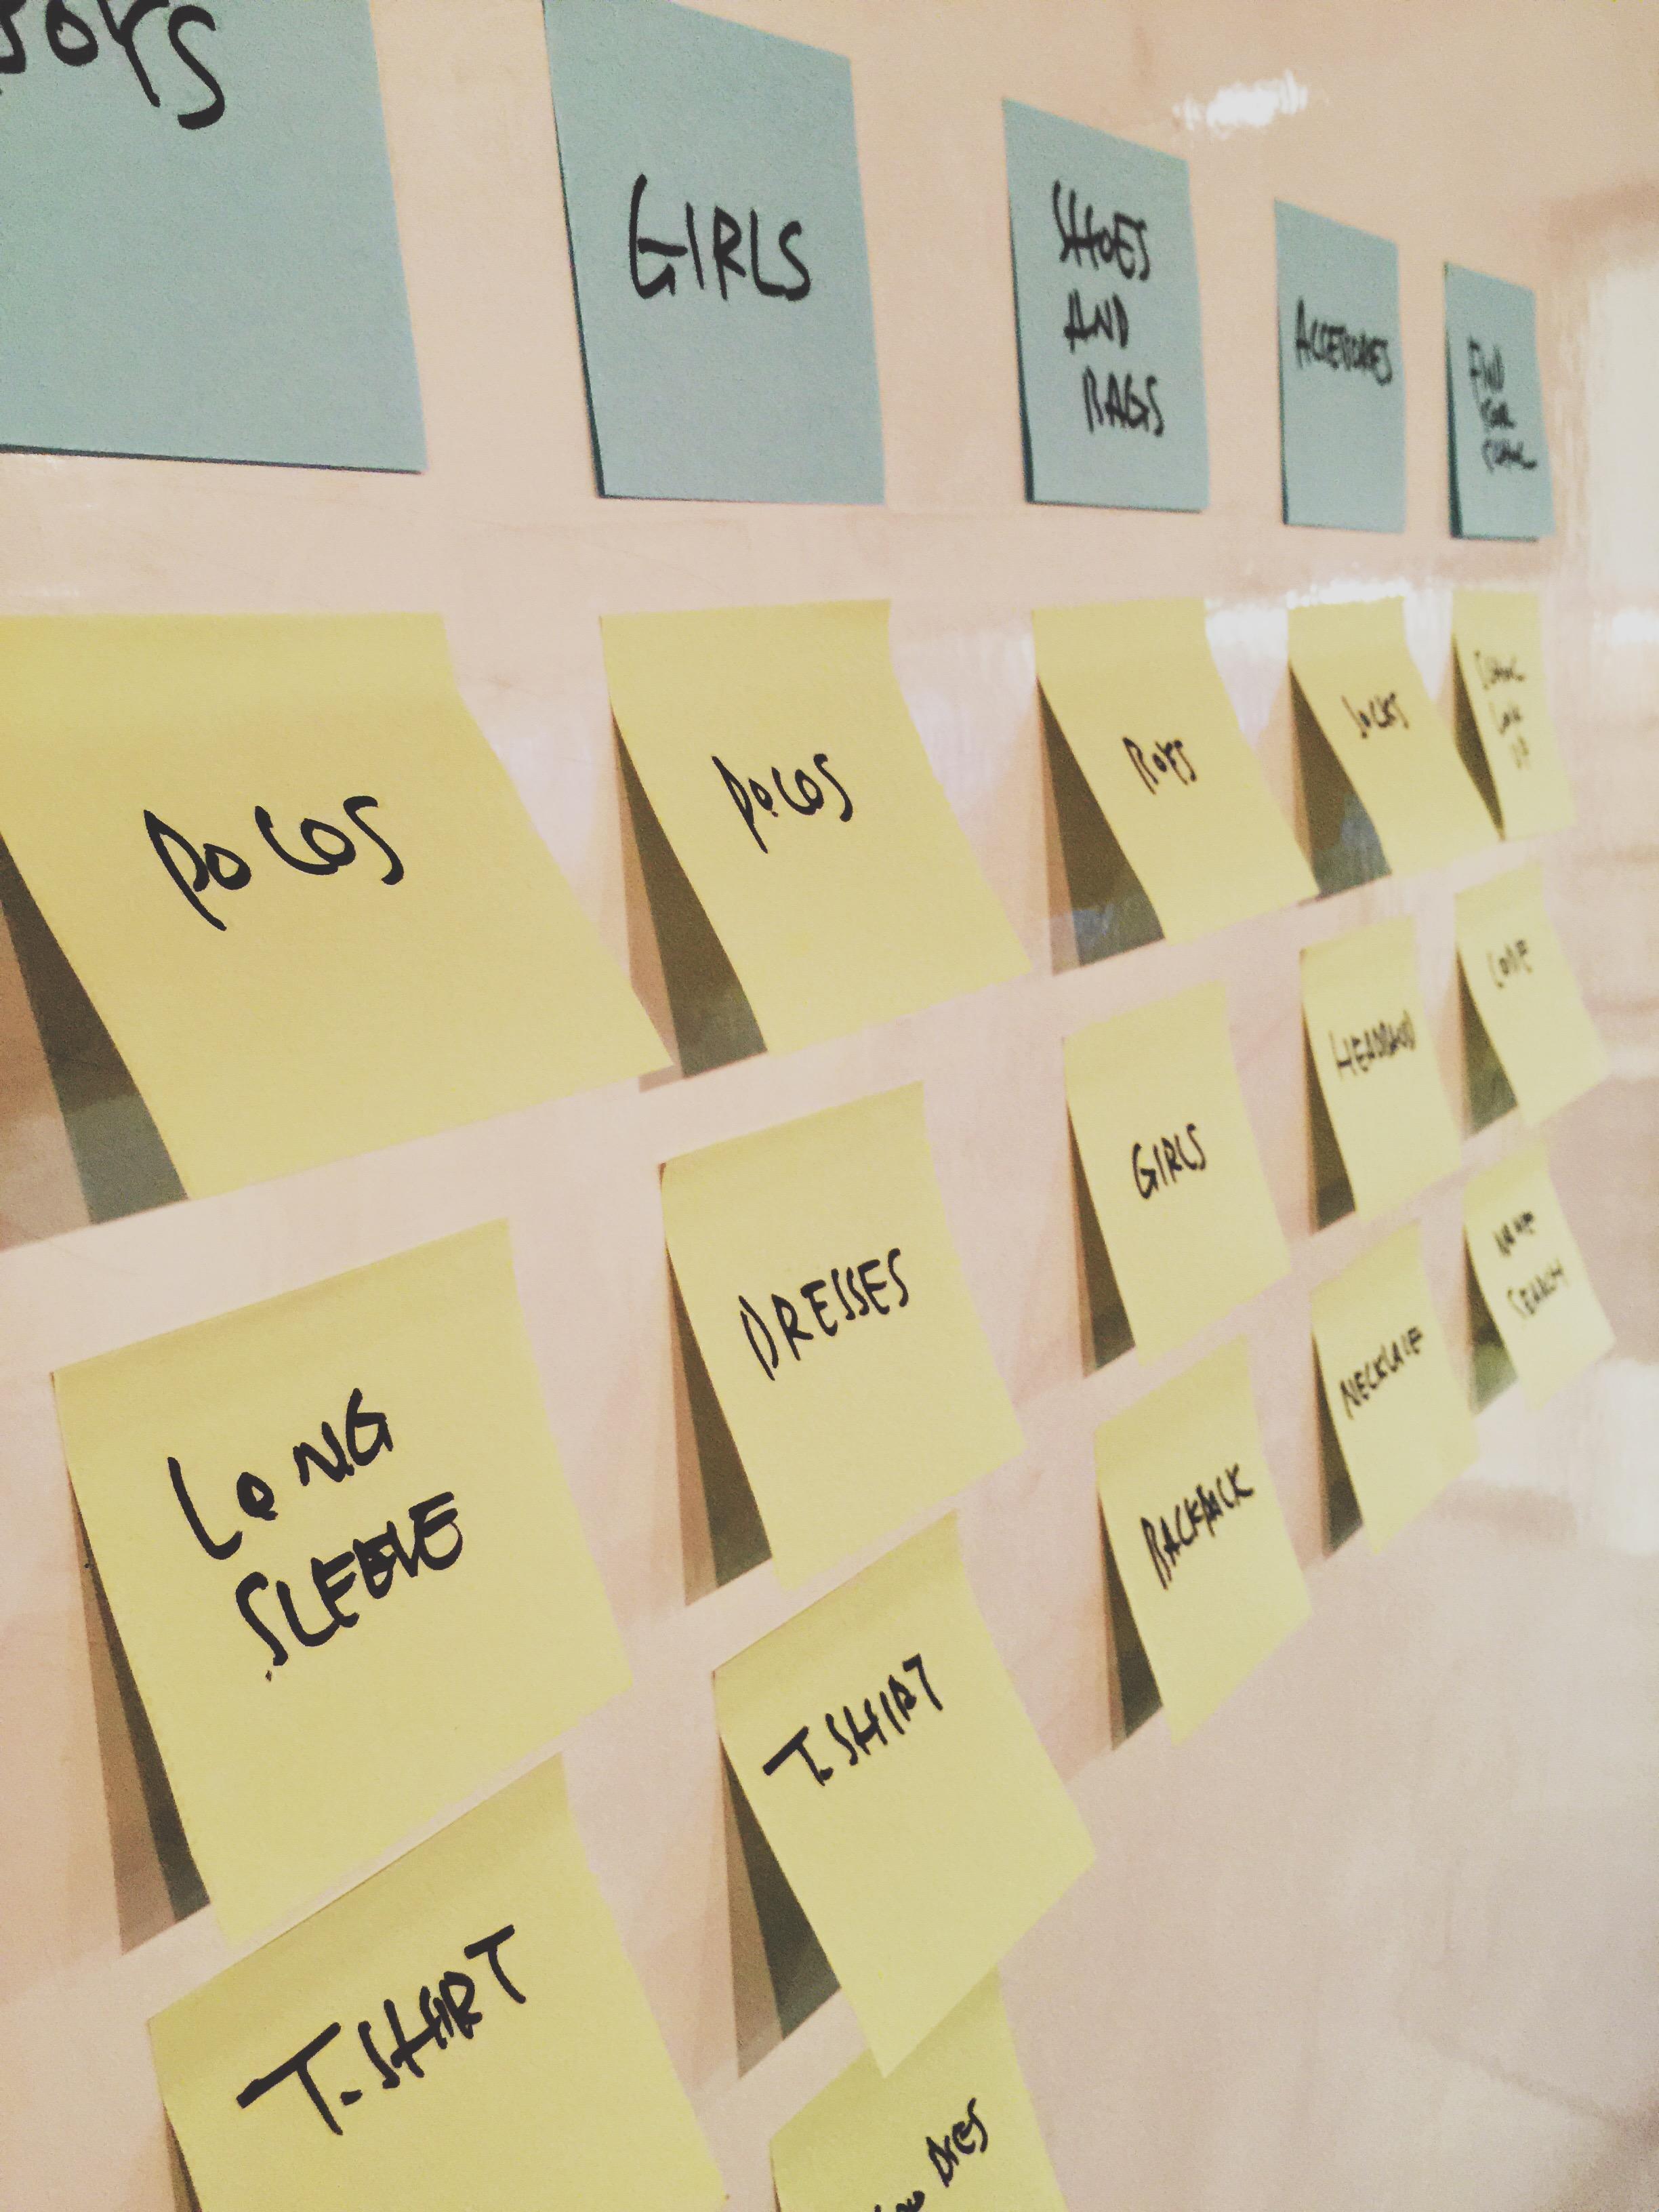 Identifying Informationarchitecture